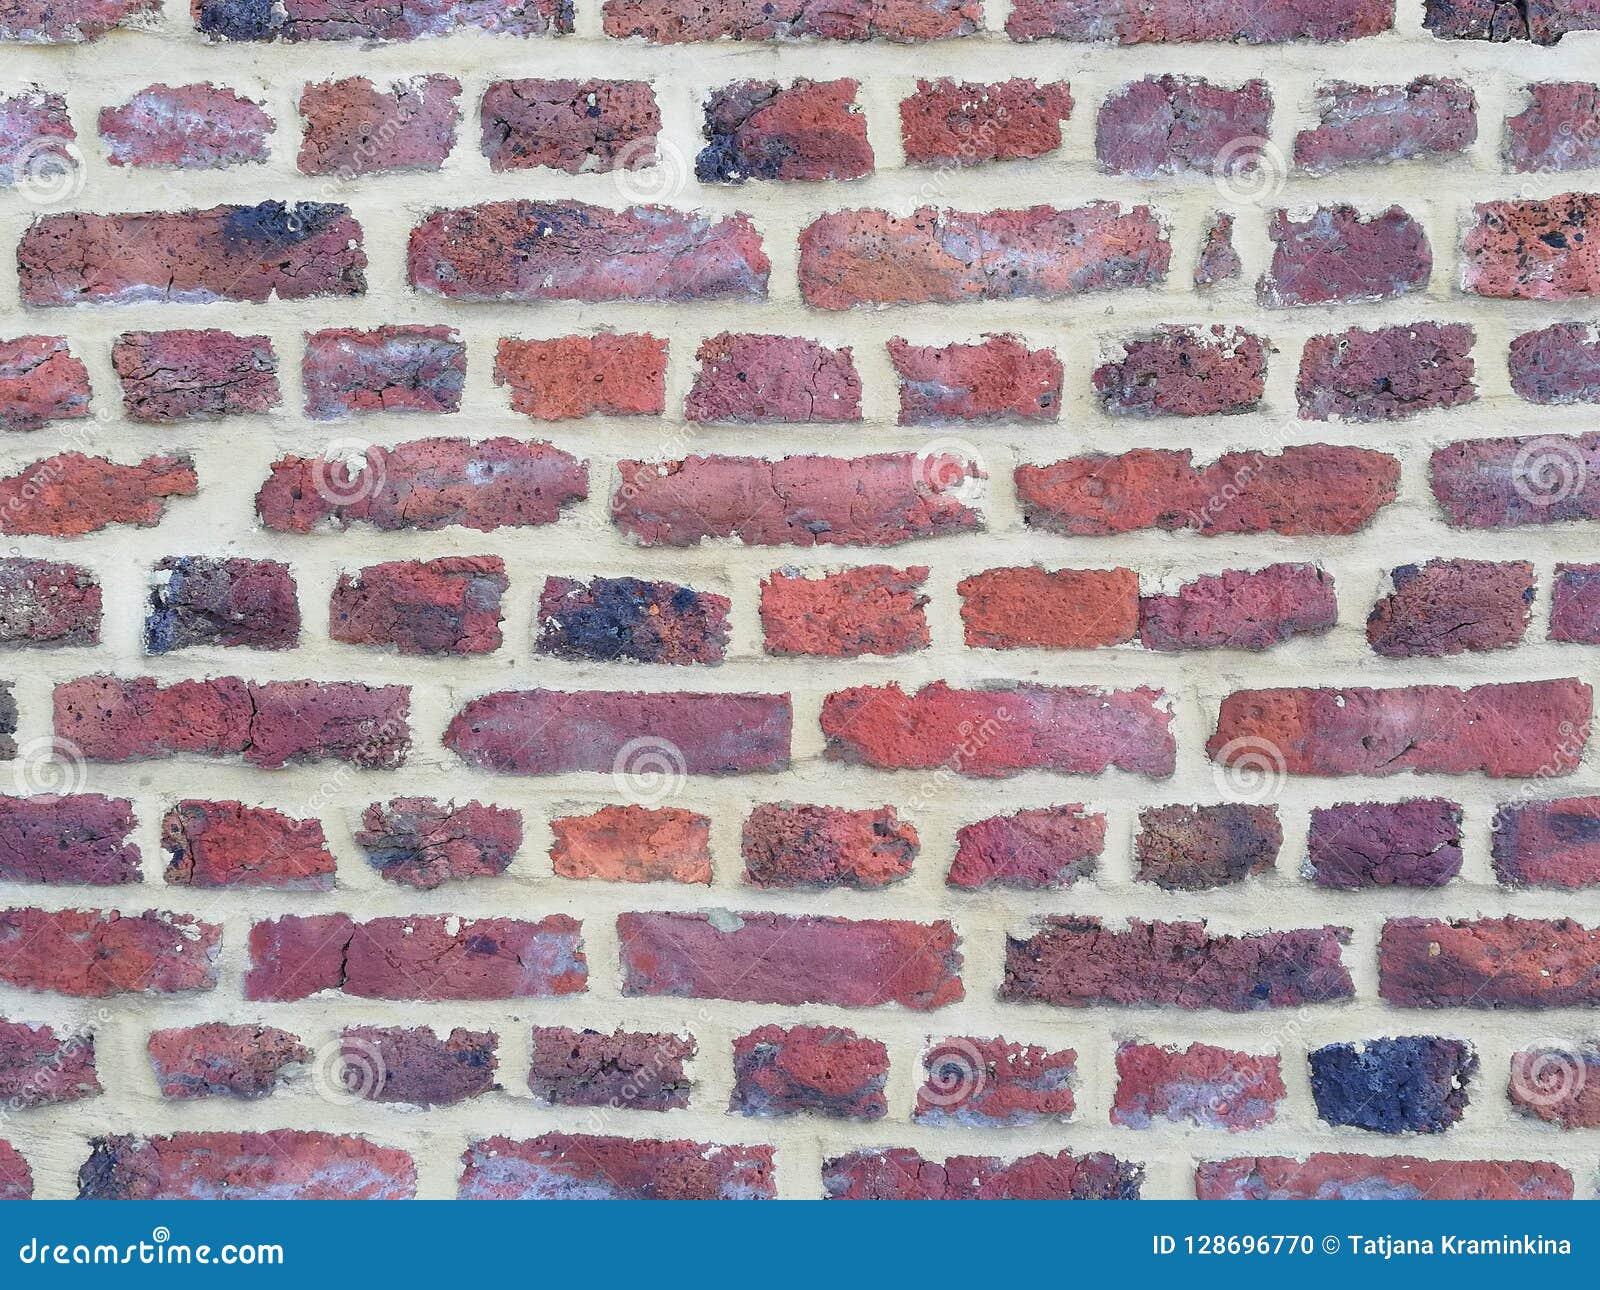 Lege Bakstenen muurtextuur Geschilderde Verontruste Muuroppervlakte Grungy Brede Brickwall Het Grungerood obstructie voert achter